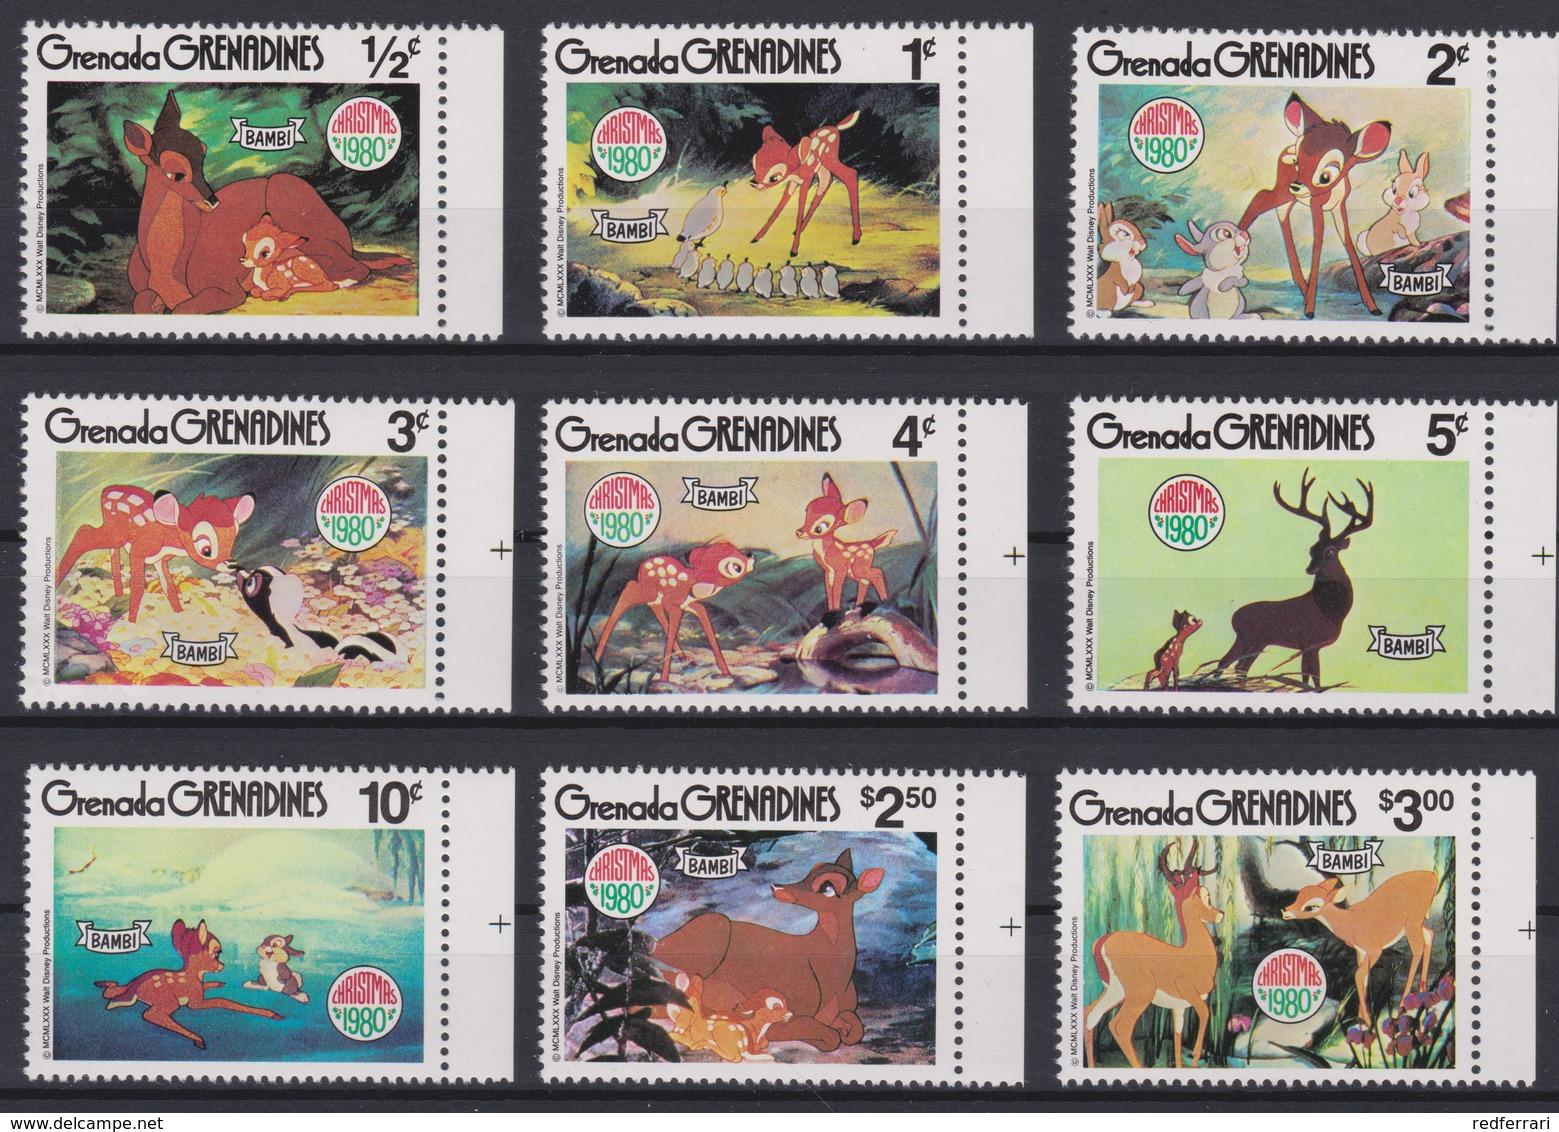 2261 WALT DISNEY - Grenada Grenadines ( Christmas 1980 ) BAMBI - Illustrations With The Characters In Walt Disney . - Disney